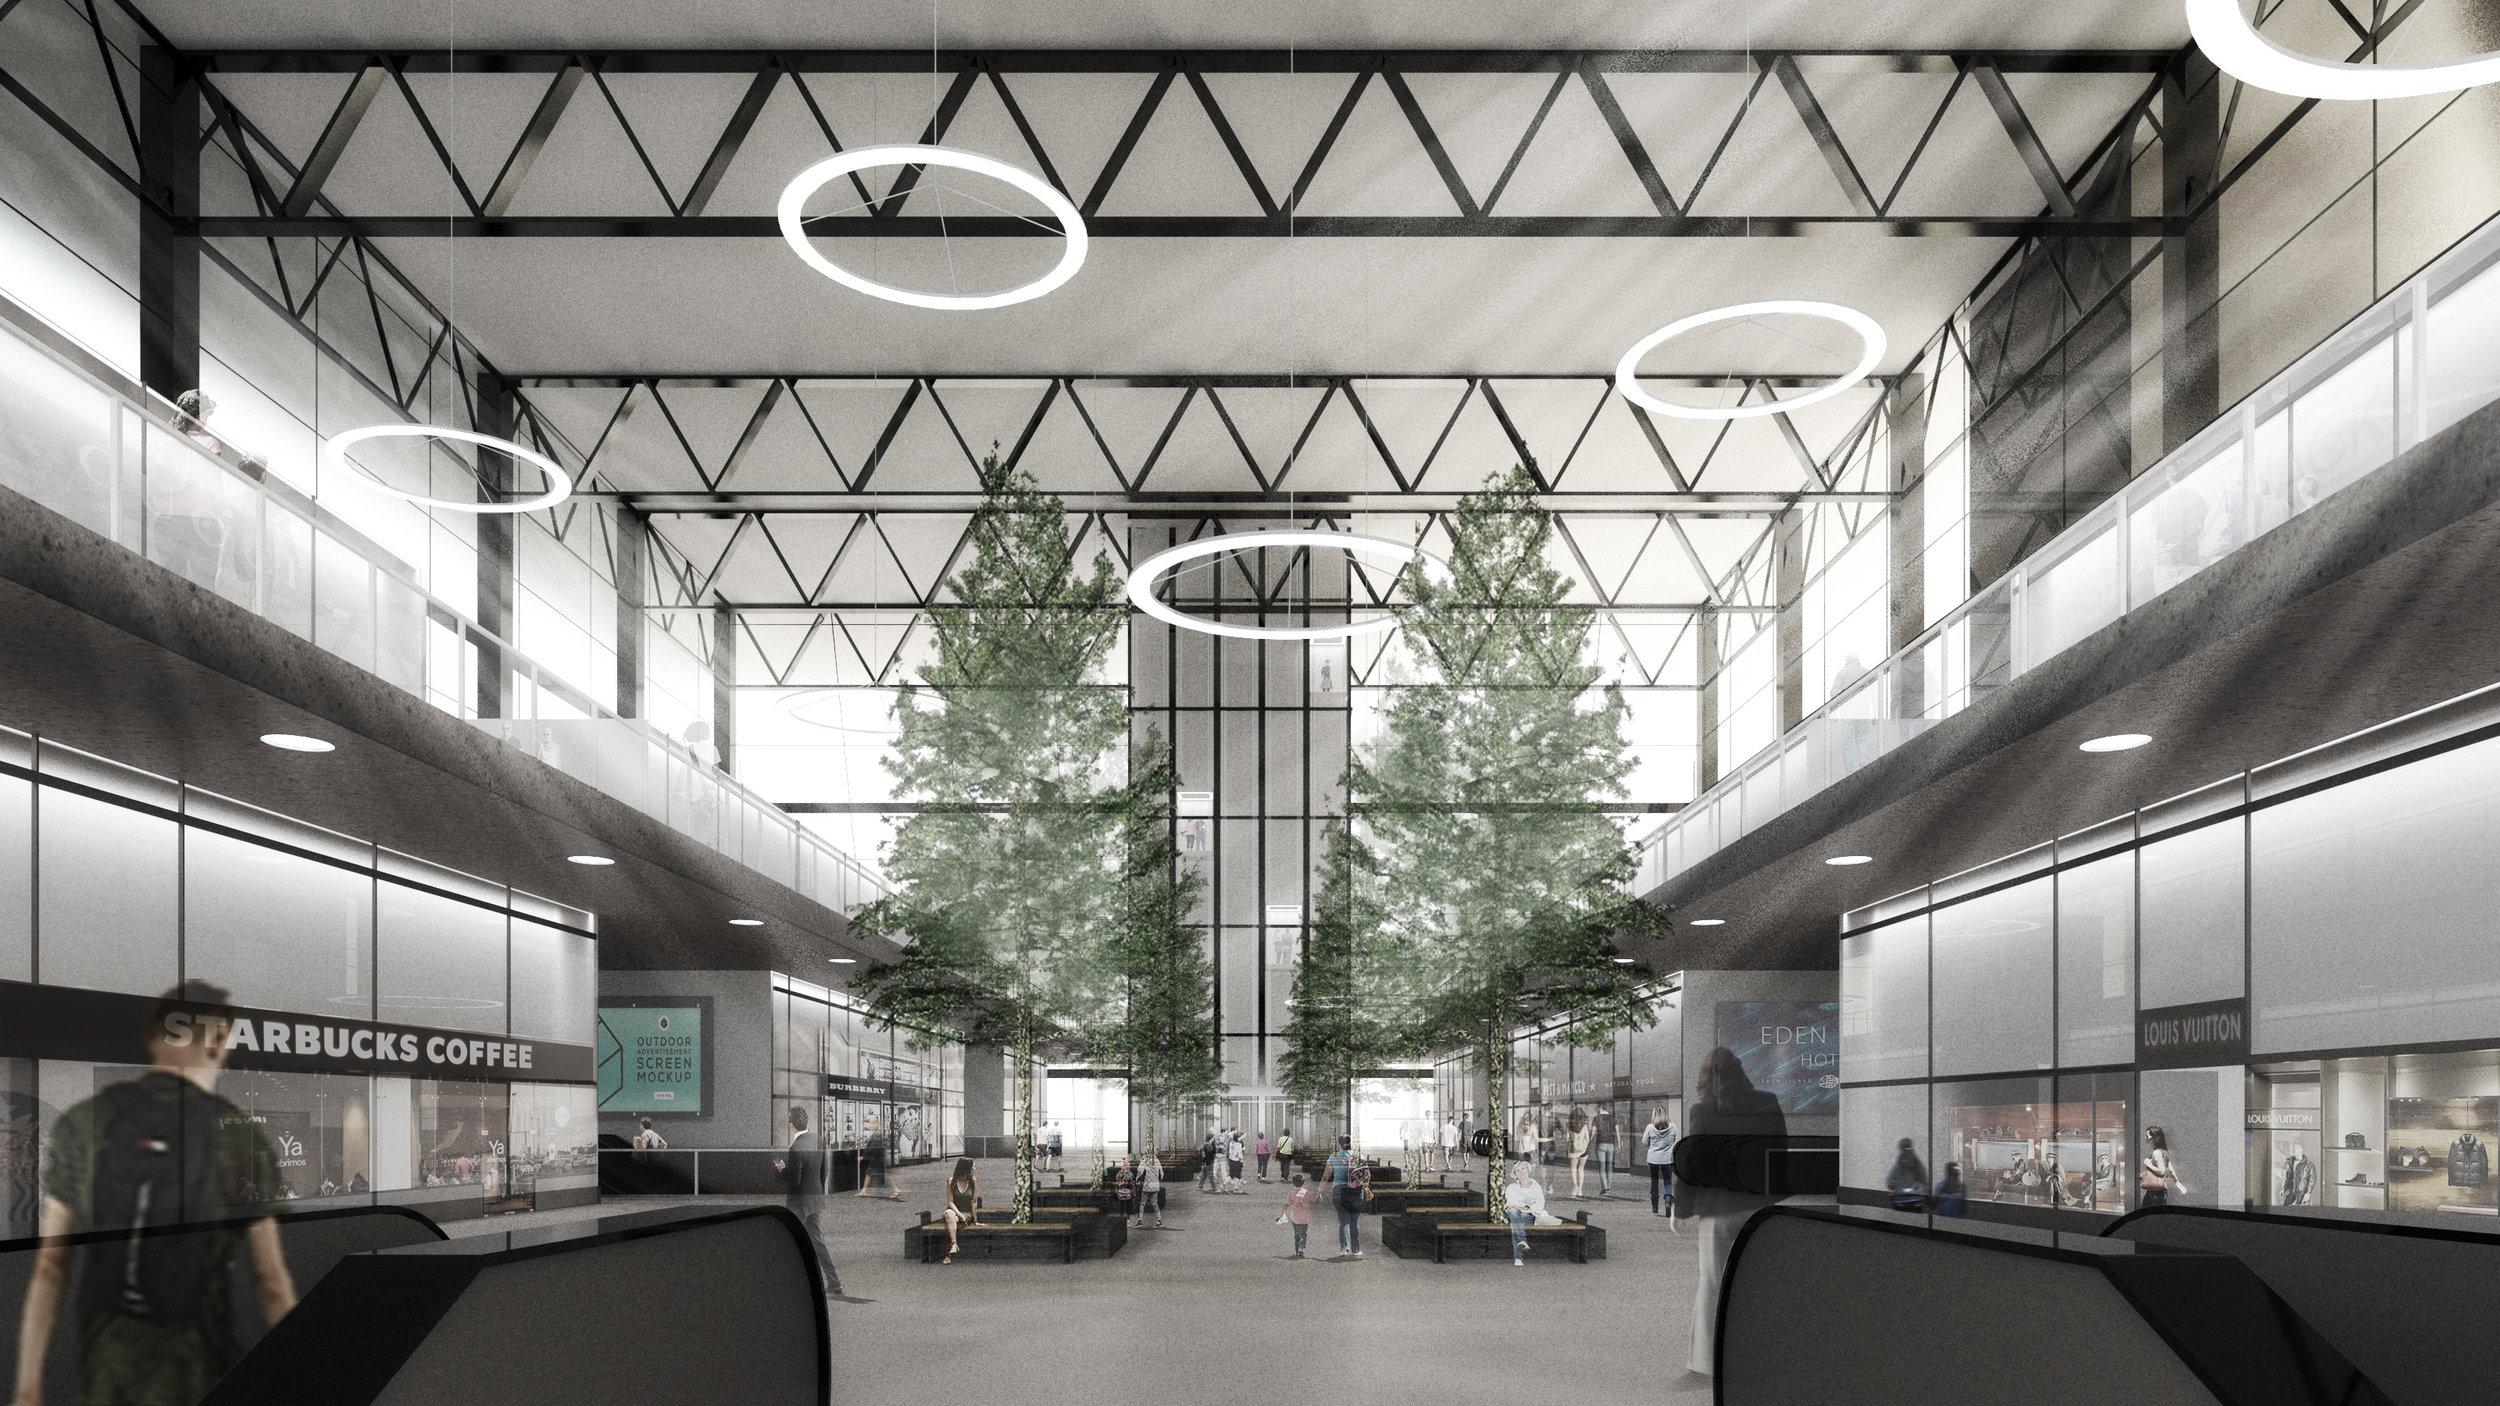 Terminal interior view